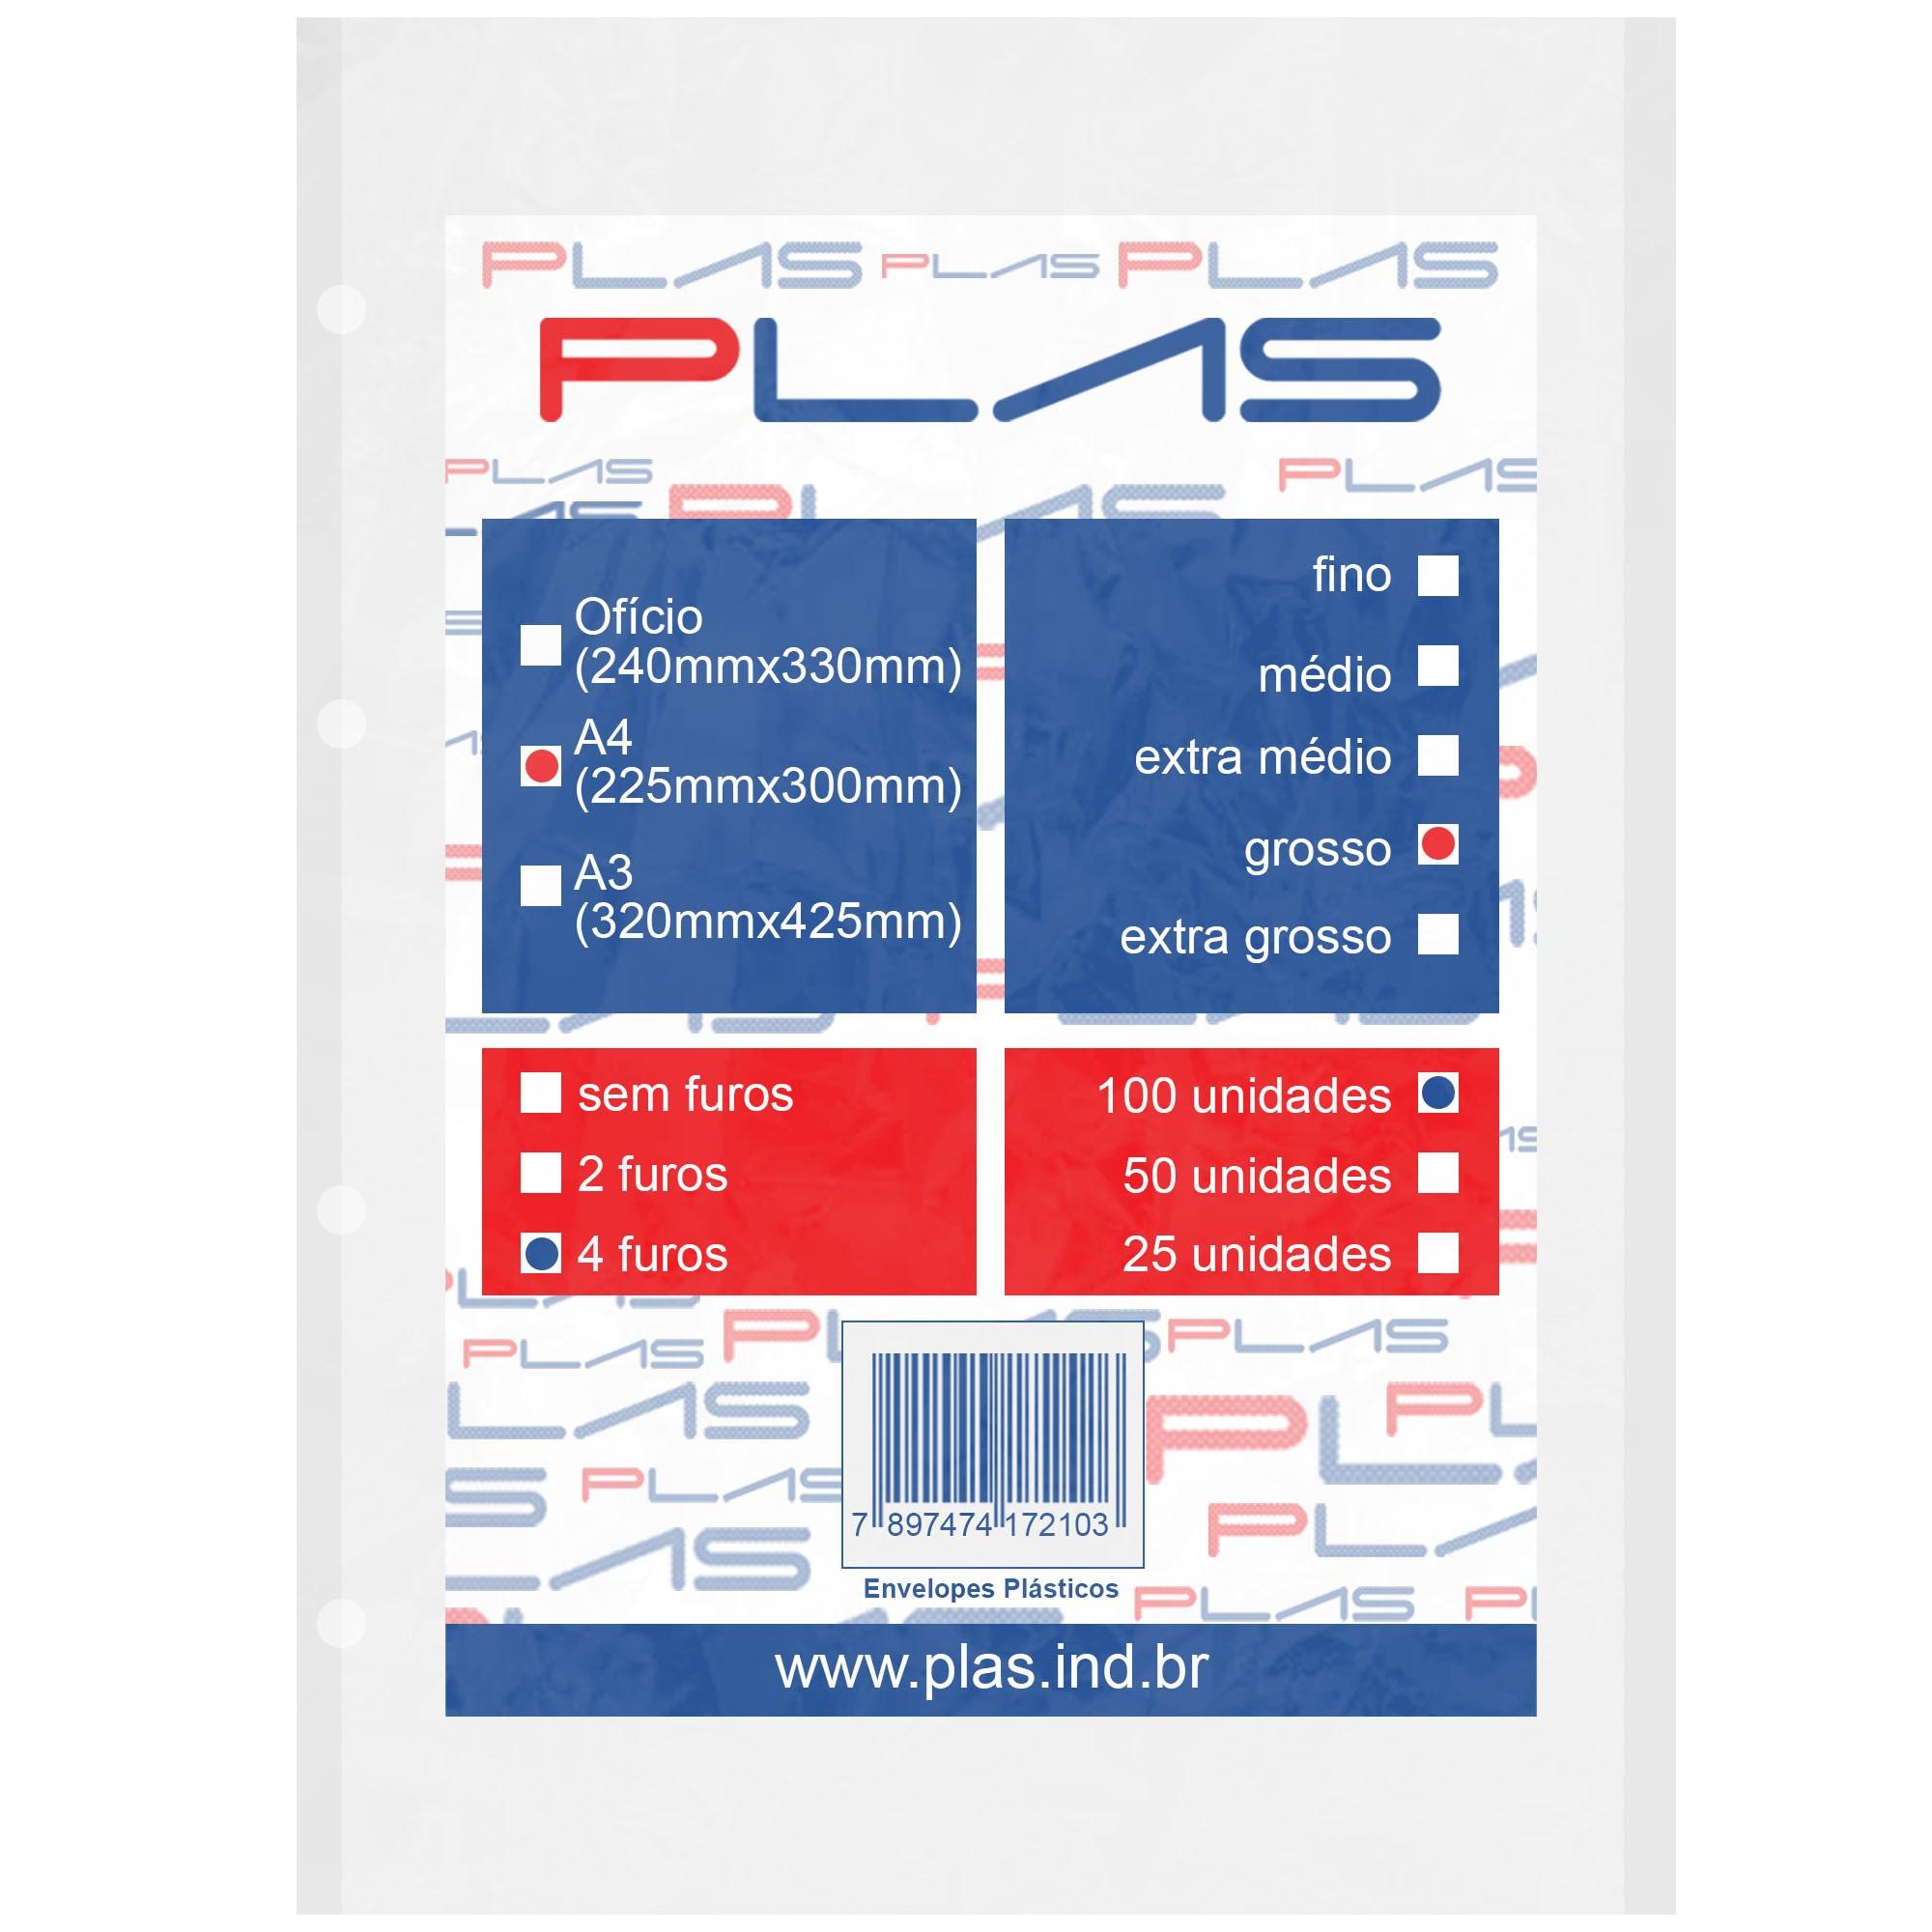 Envelope Saco Plastico tamanho A4 4 furos Grosso pct c/ 100 un - Iplas